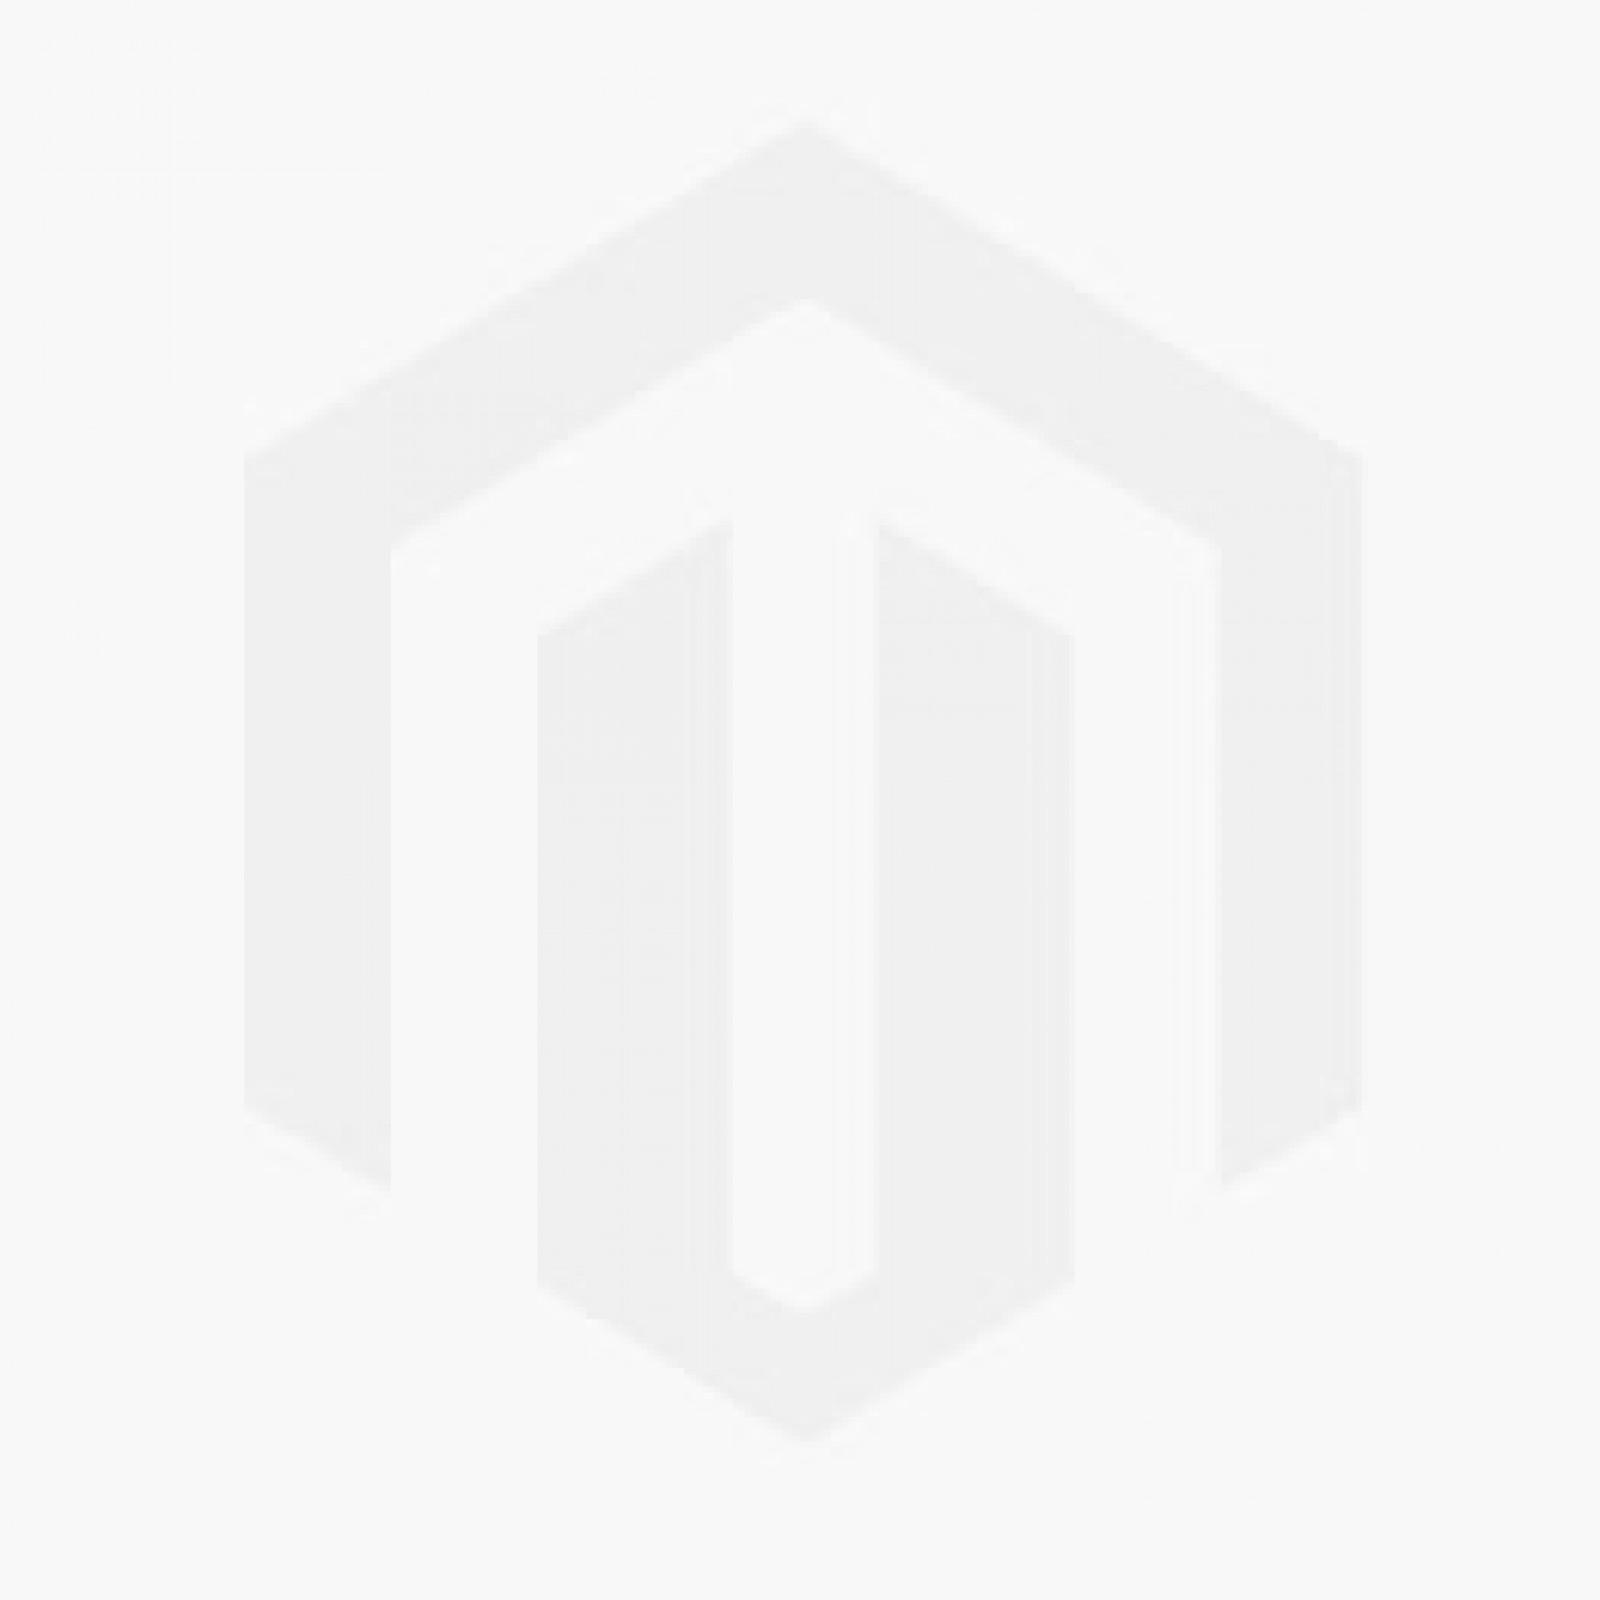 bac de coffre pour volkswagen golf 7 variant sol inf rieur. Black Bedroom Furniture Sets. Home Design Ideas